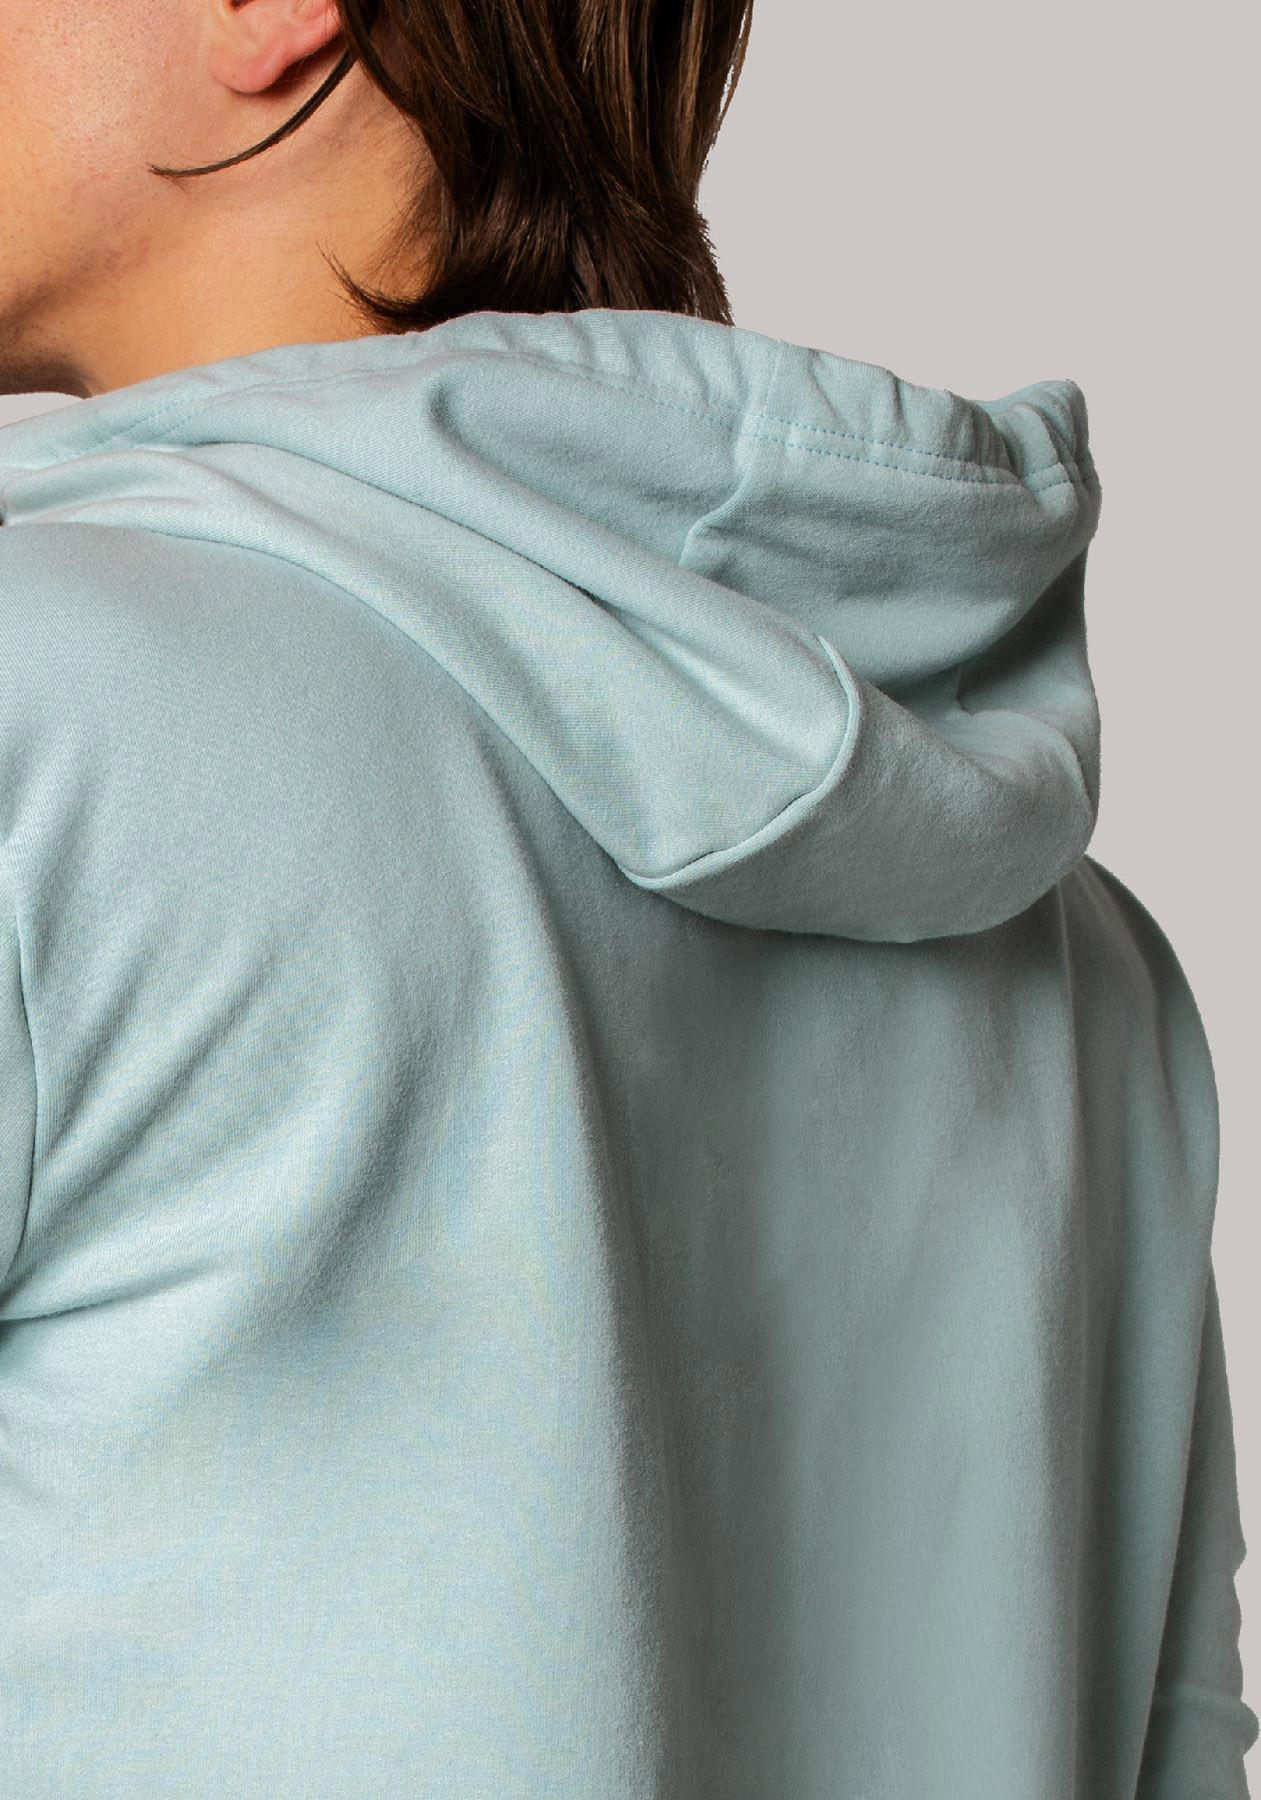 Men-Sweatshirt-ELKA-Lounge-M00572